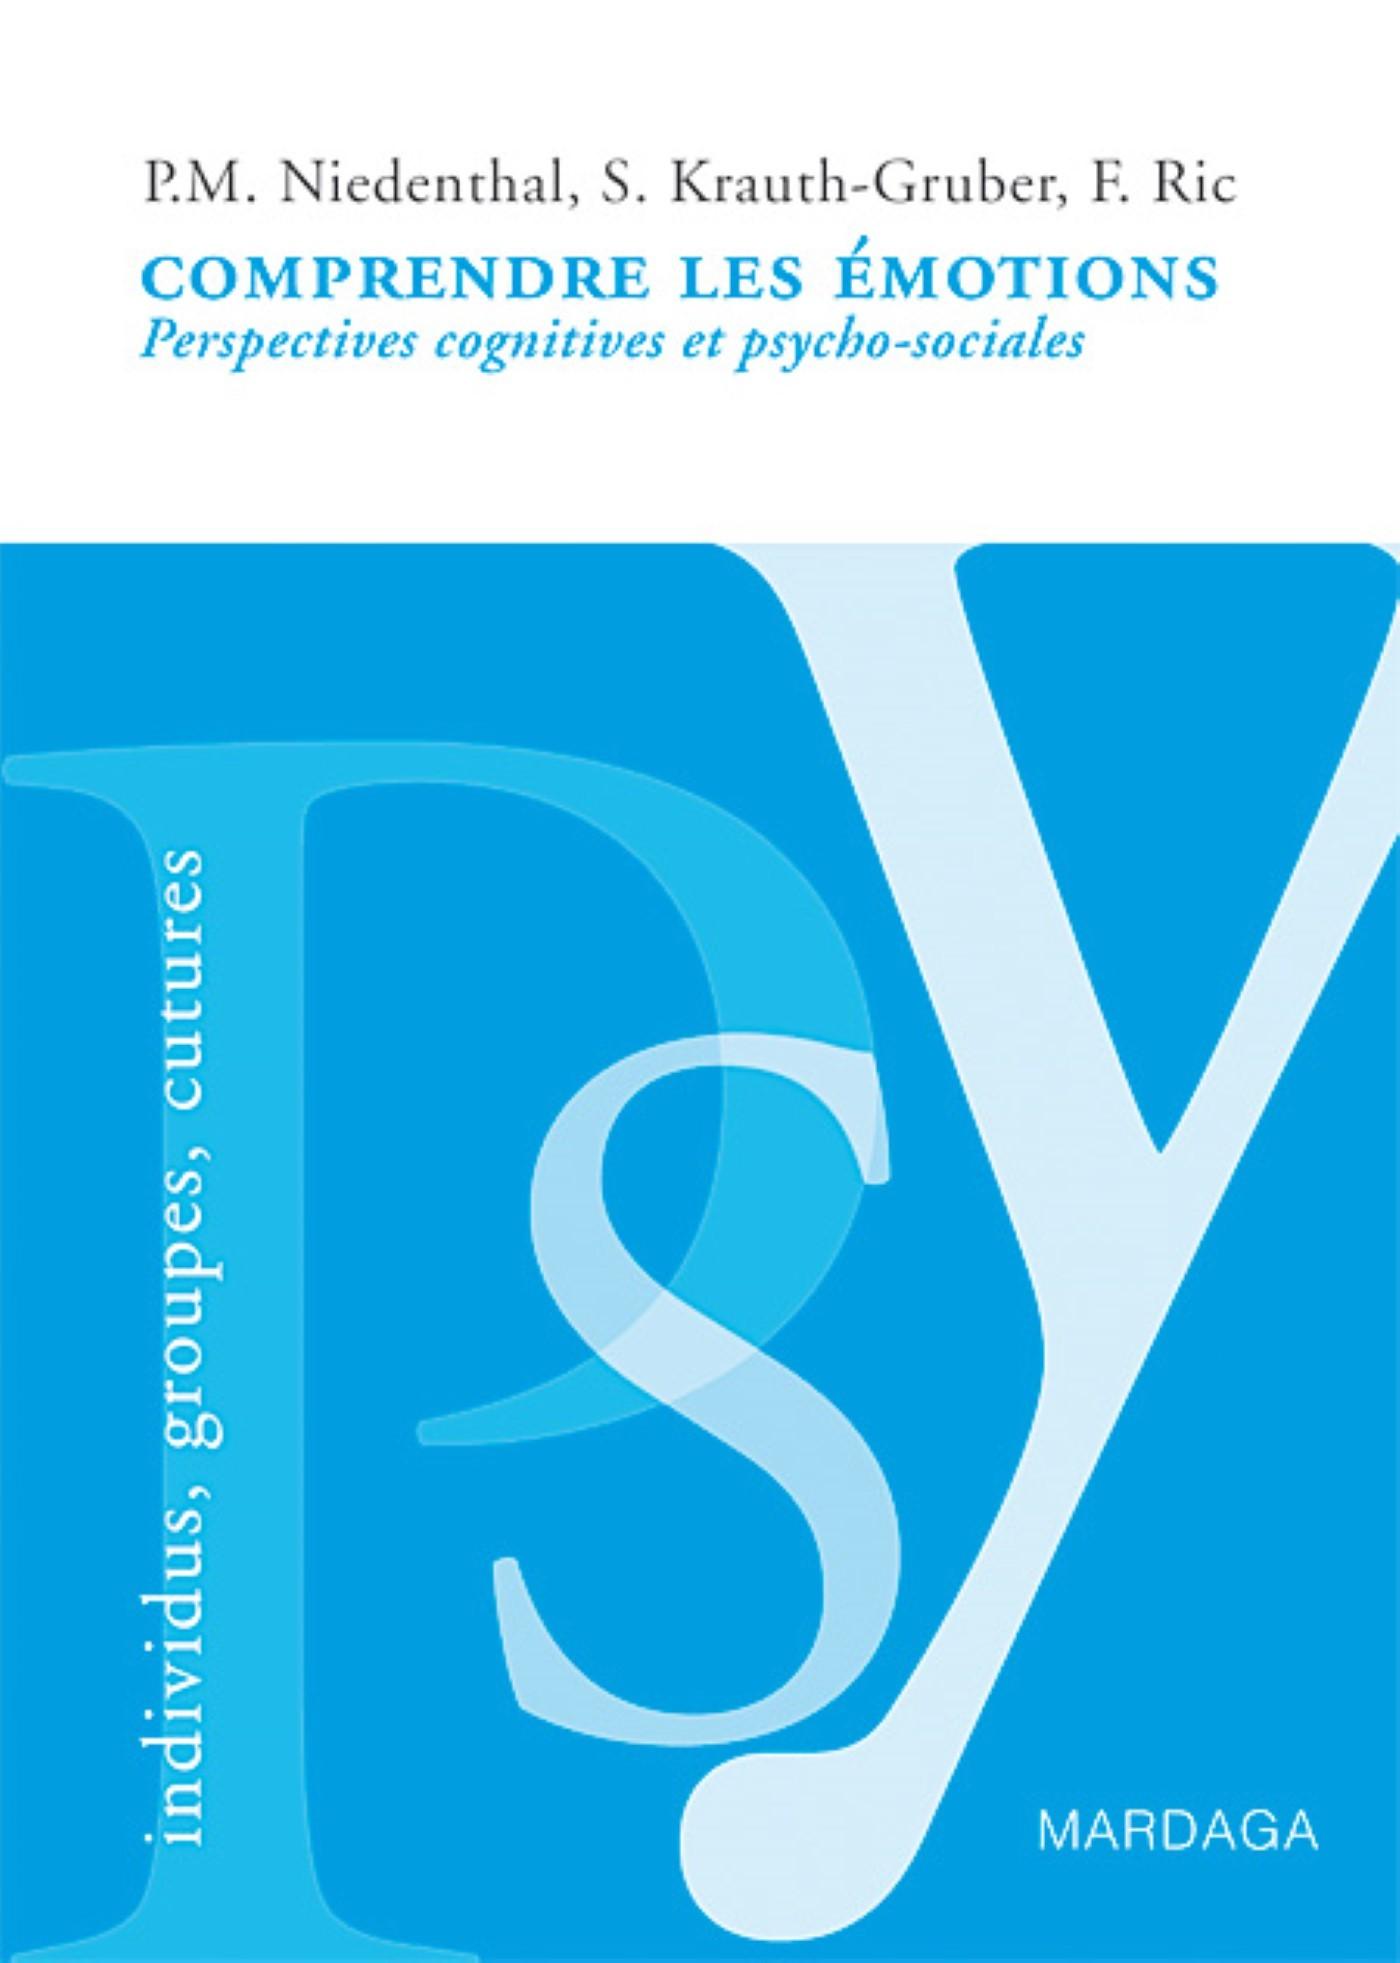 COMPRENDRE LES EMOTIONS. PERSPECTIVES PSYCHO-SOCIALES ...